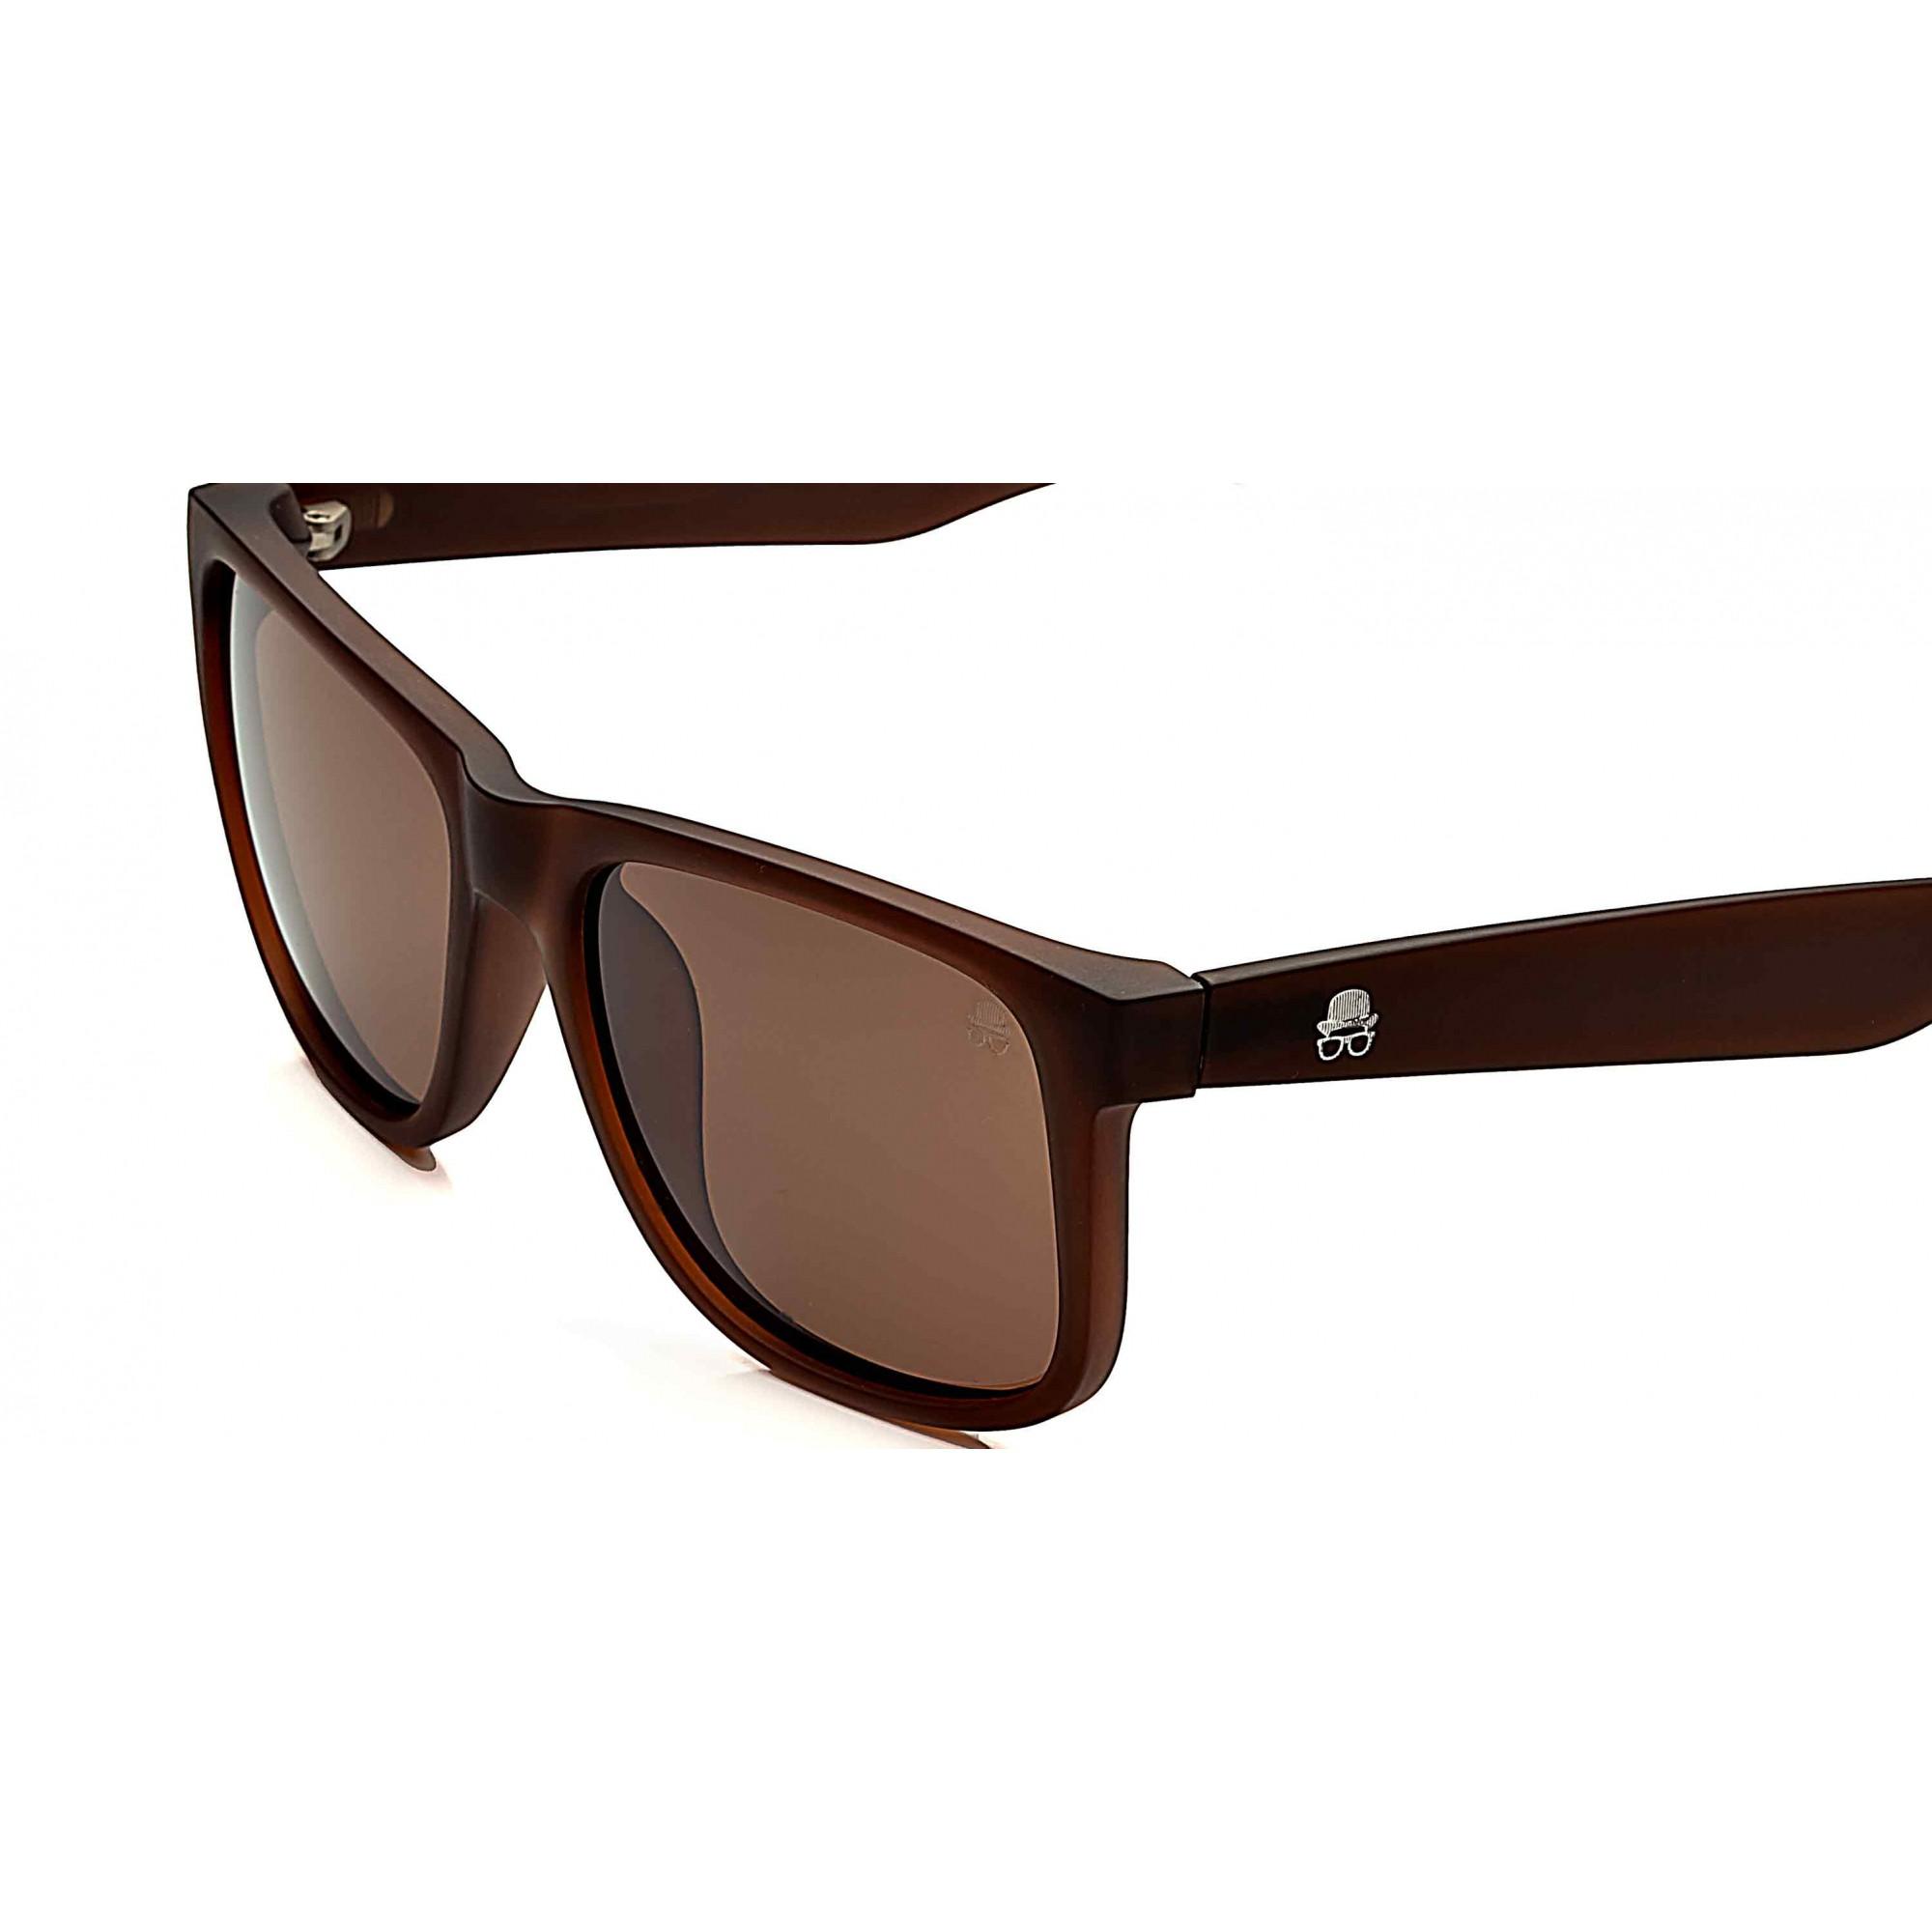 Óculos de Sol Hook + Lente Solar com Grau